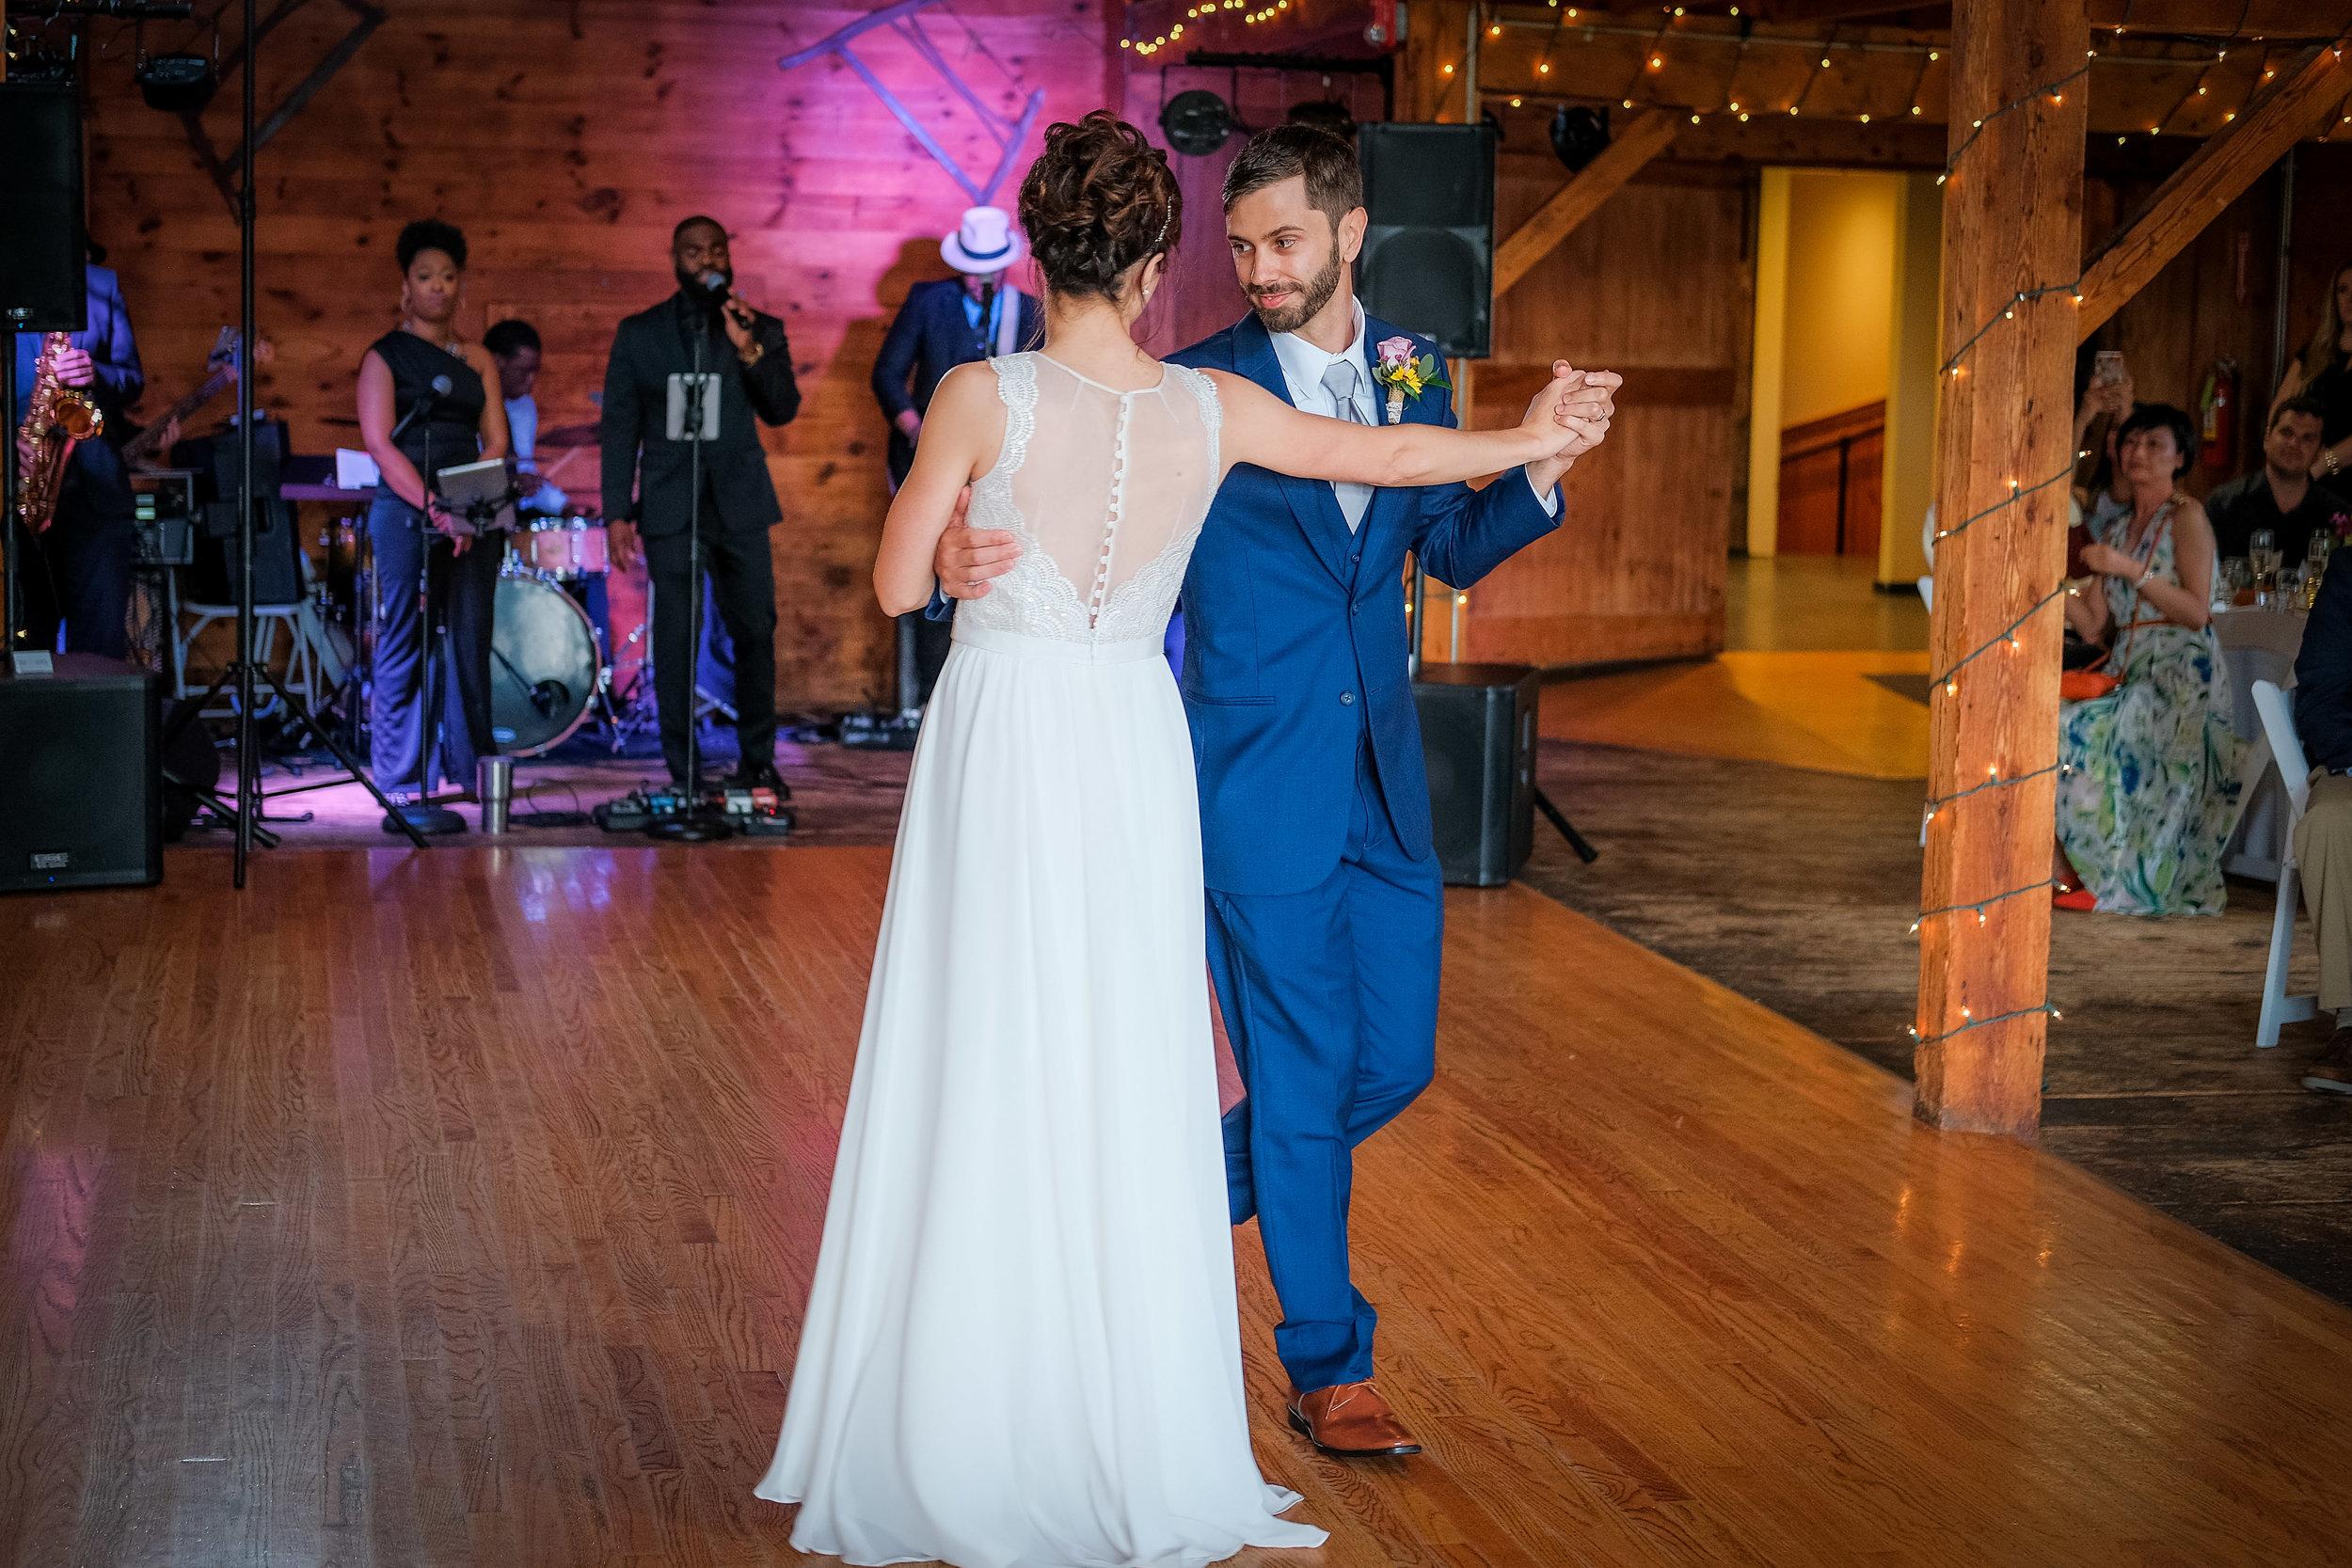 Peabody-Smith-Barn-Wedding-Photography-29.jpg